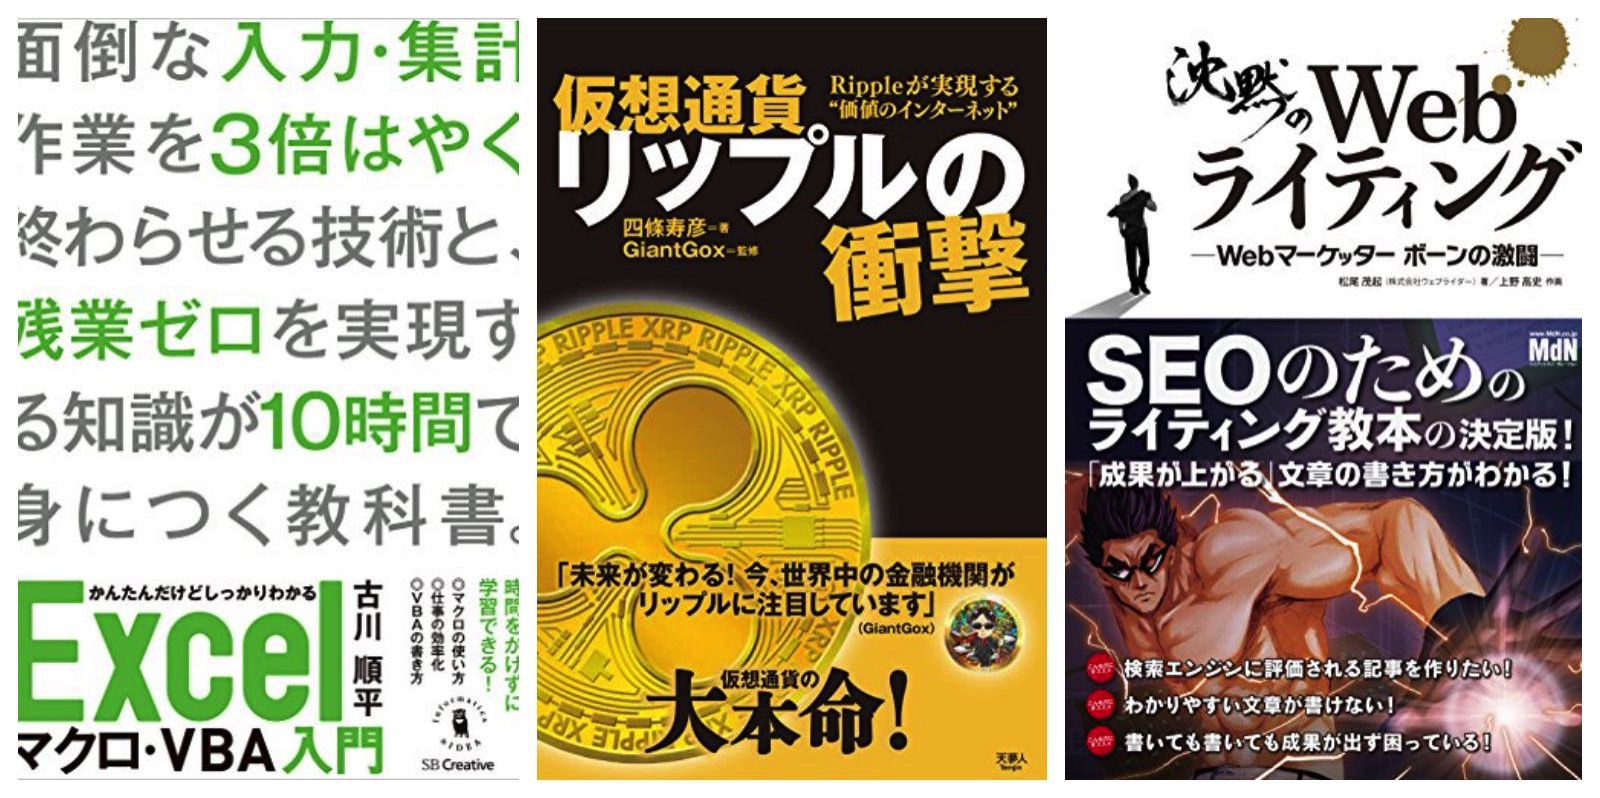 IT Book Sale 20180622 2